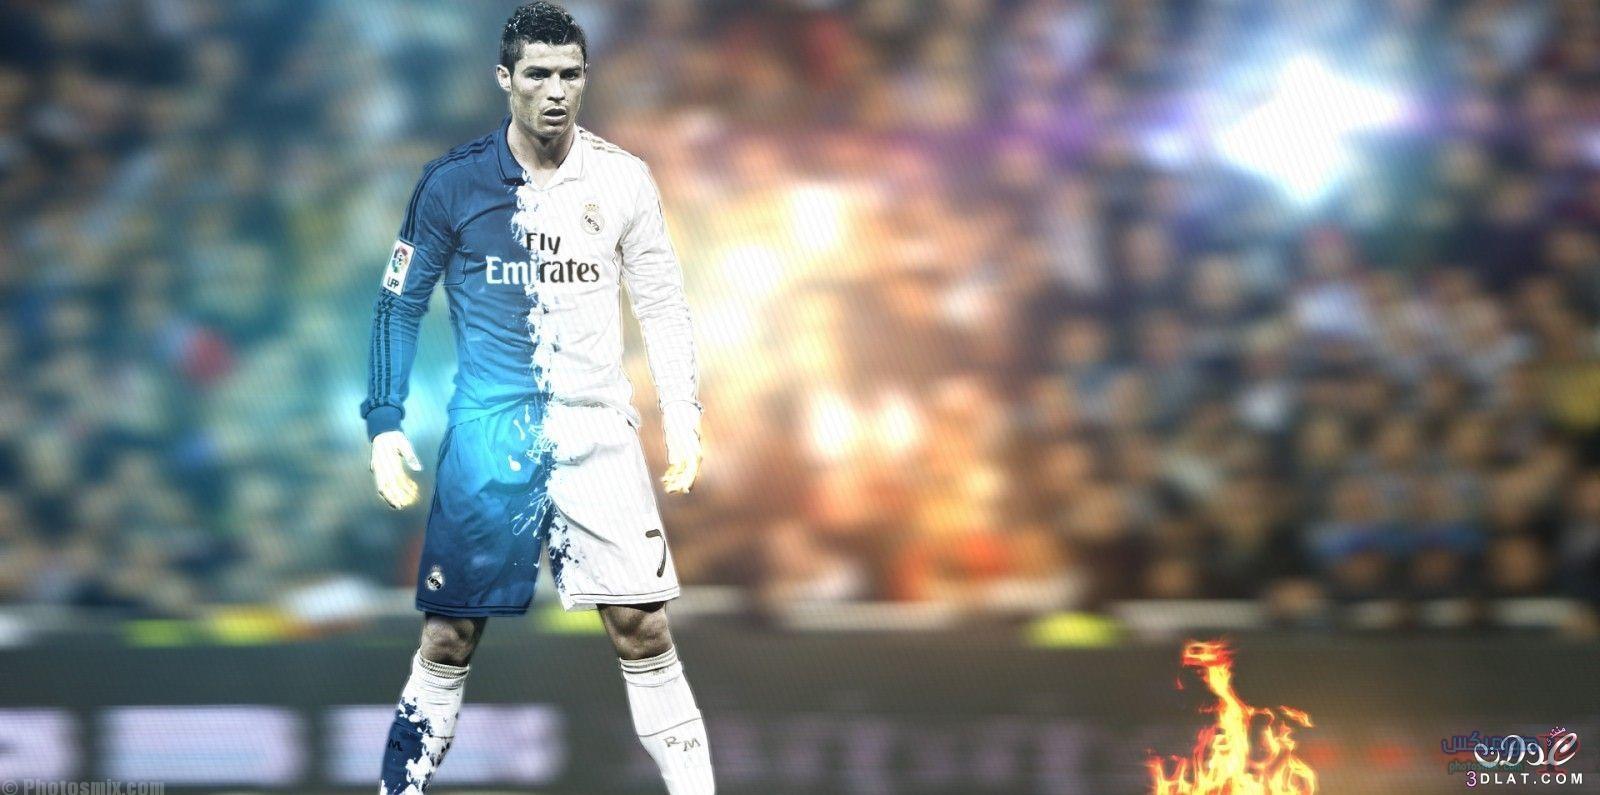 -رصور-رونالدو-بالملعب-2 صور كريستيانو رونالدو , اجمل صور Ronaldo 2018 , خلفيات ورمزيات رونالدو